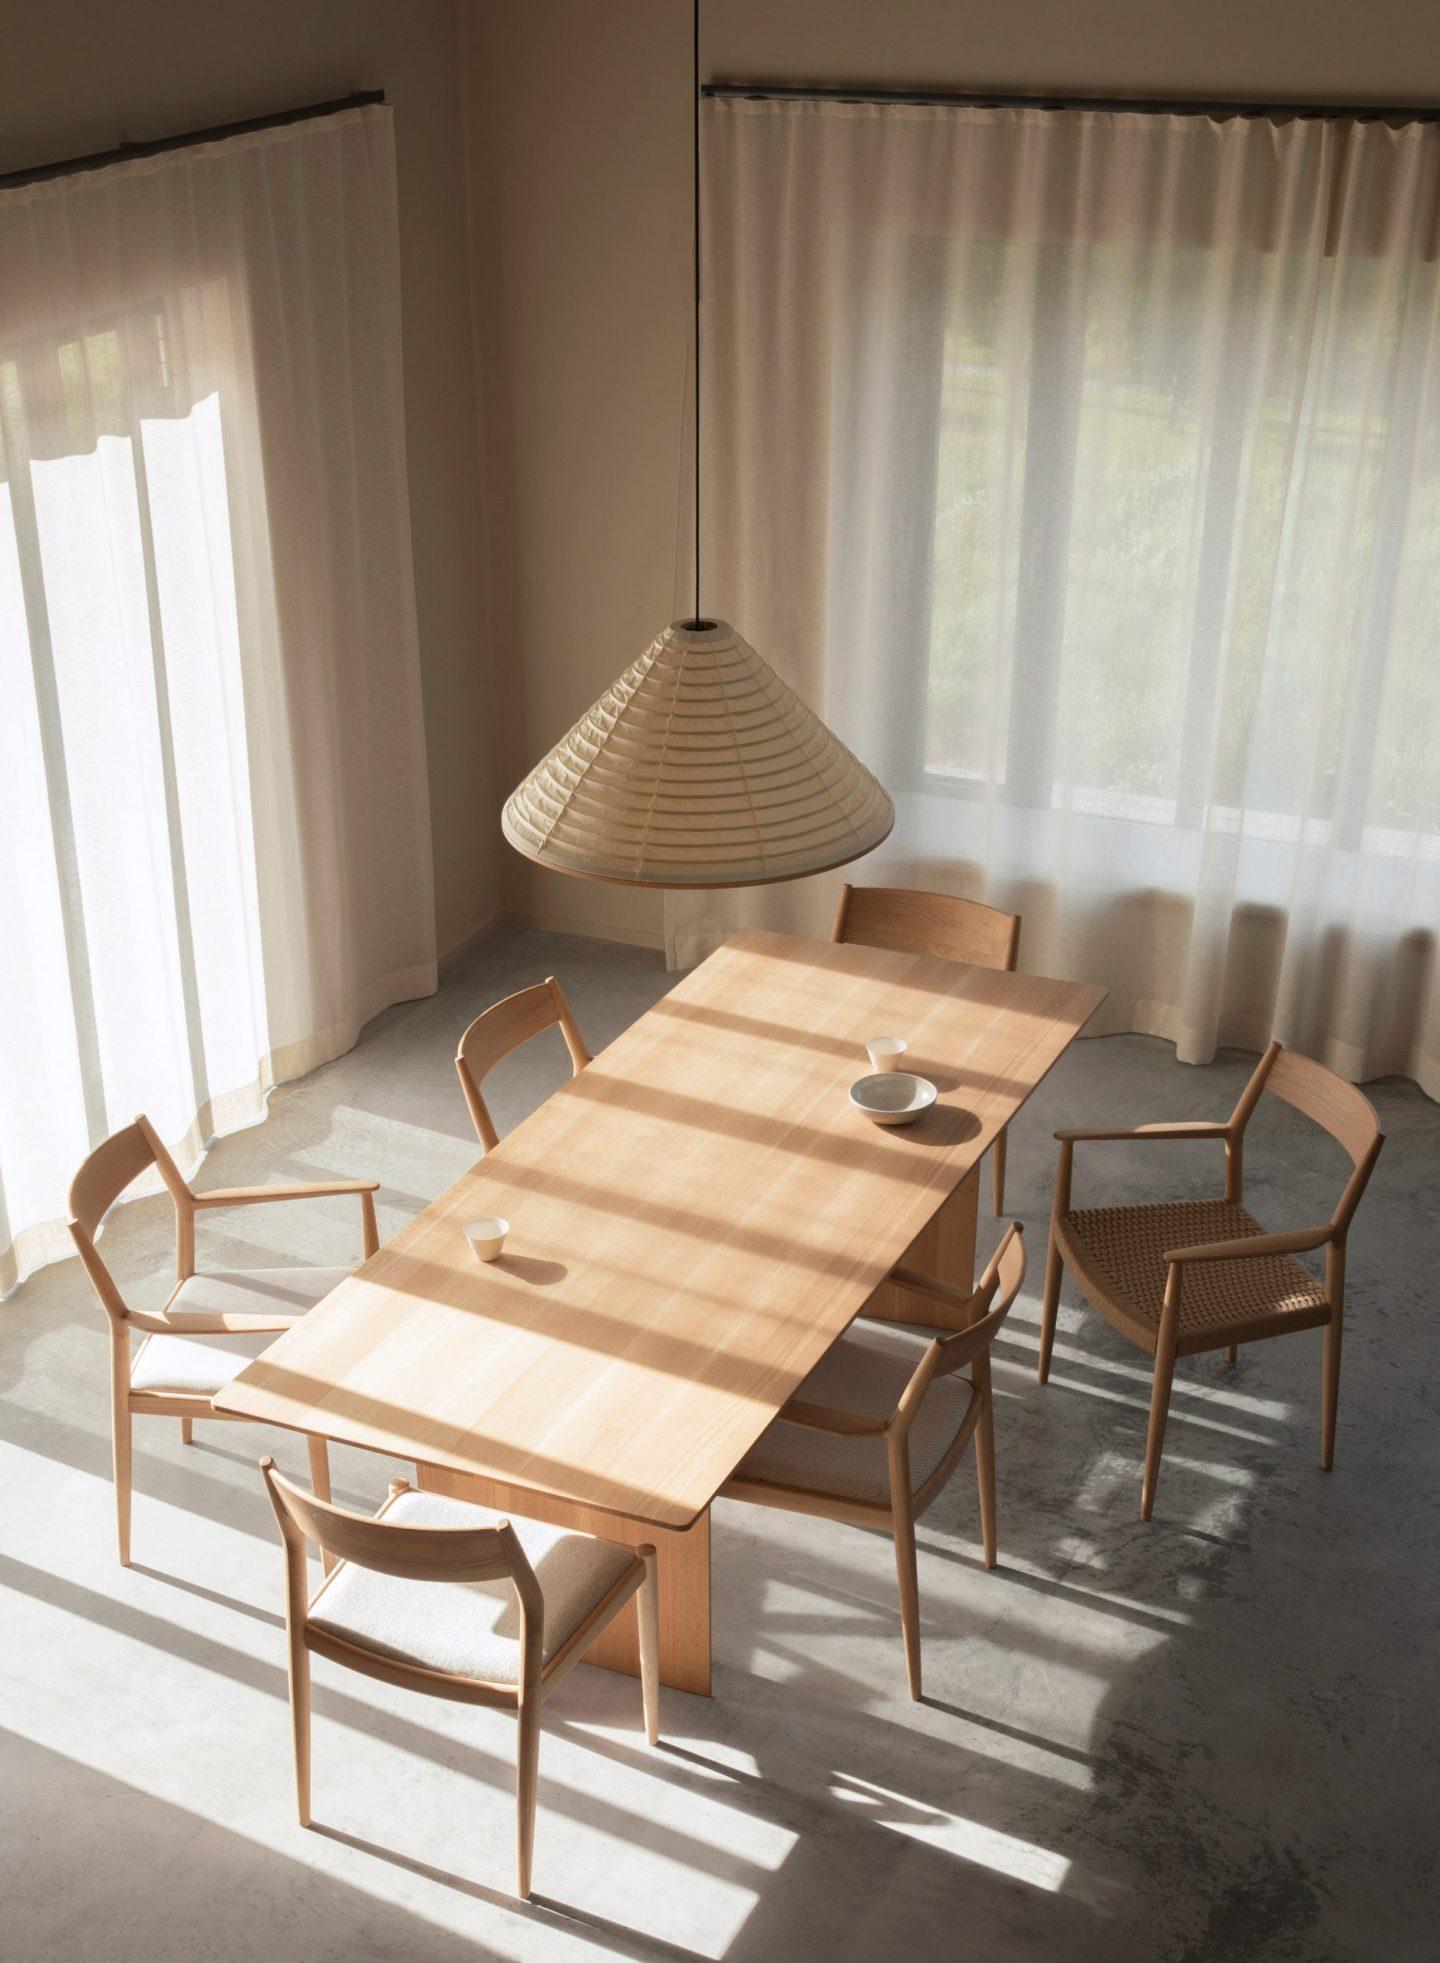 IGNANT-Architecture-Norm-Architects-Archipelago-House-013